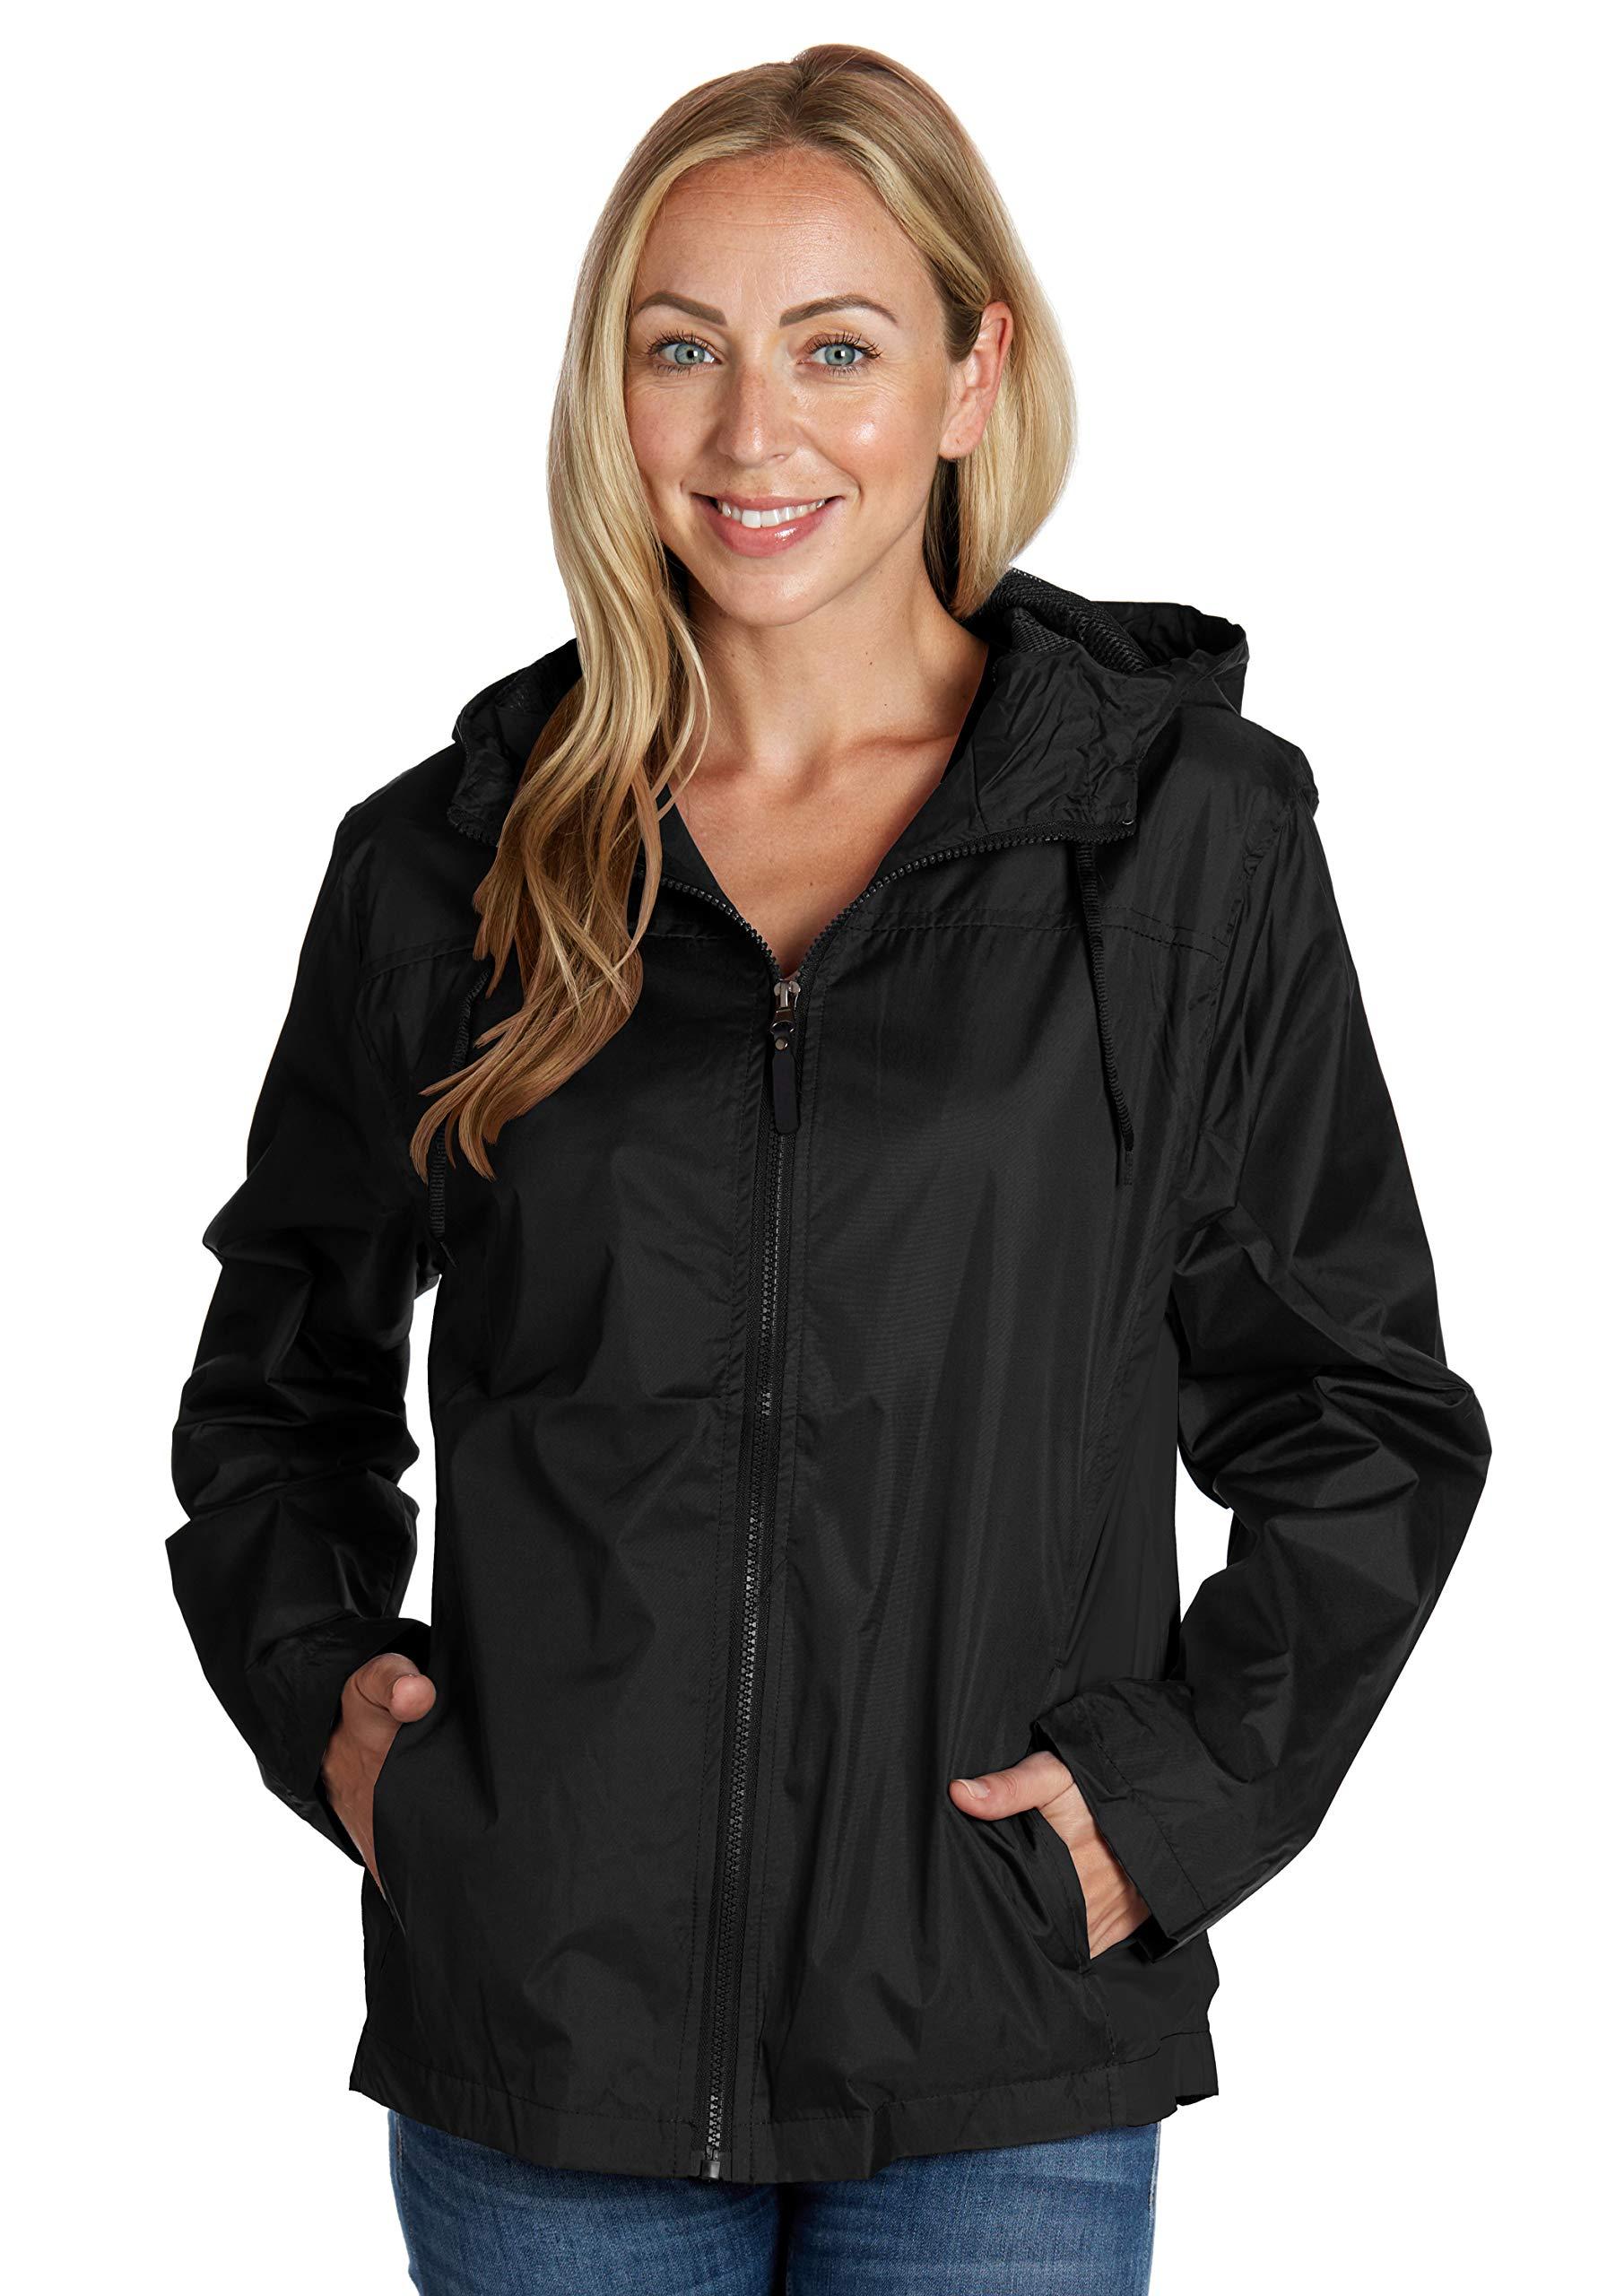 Equipment De Sport USA Womens Golf Jacket Black Hooded Small Windbreaker